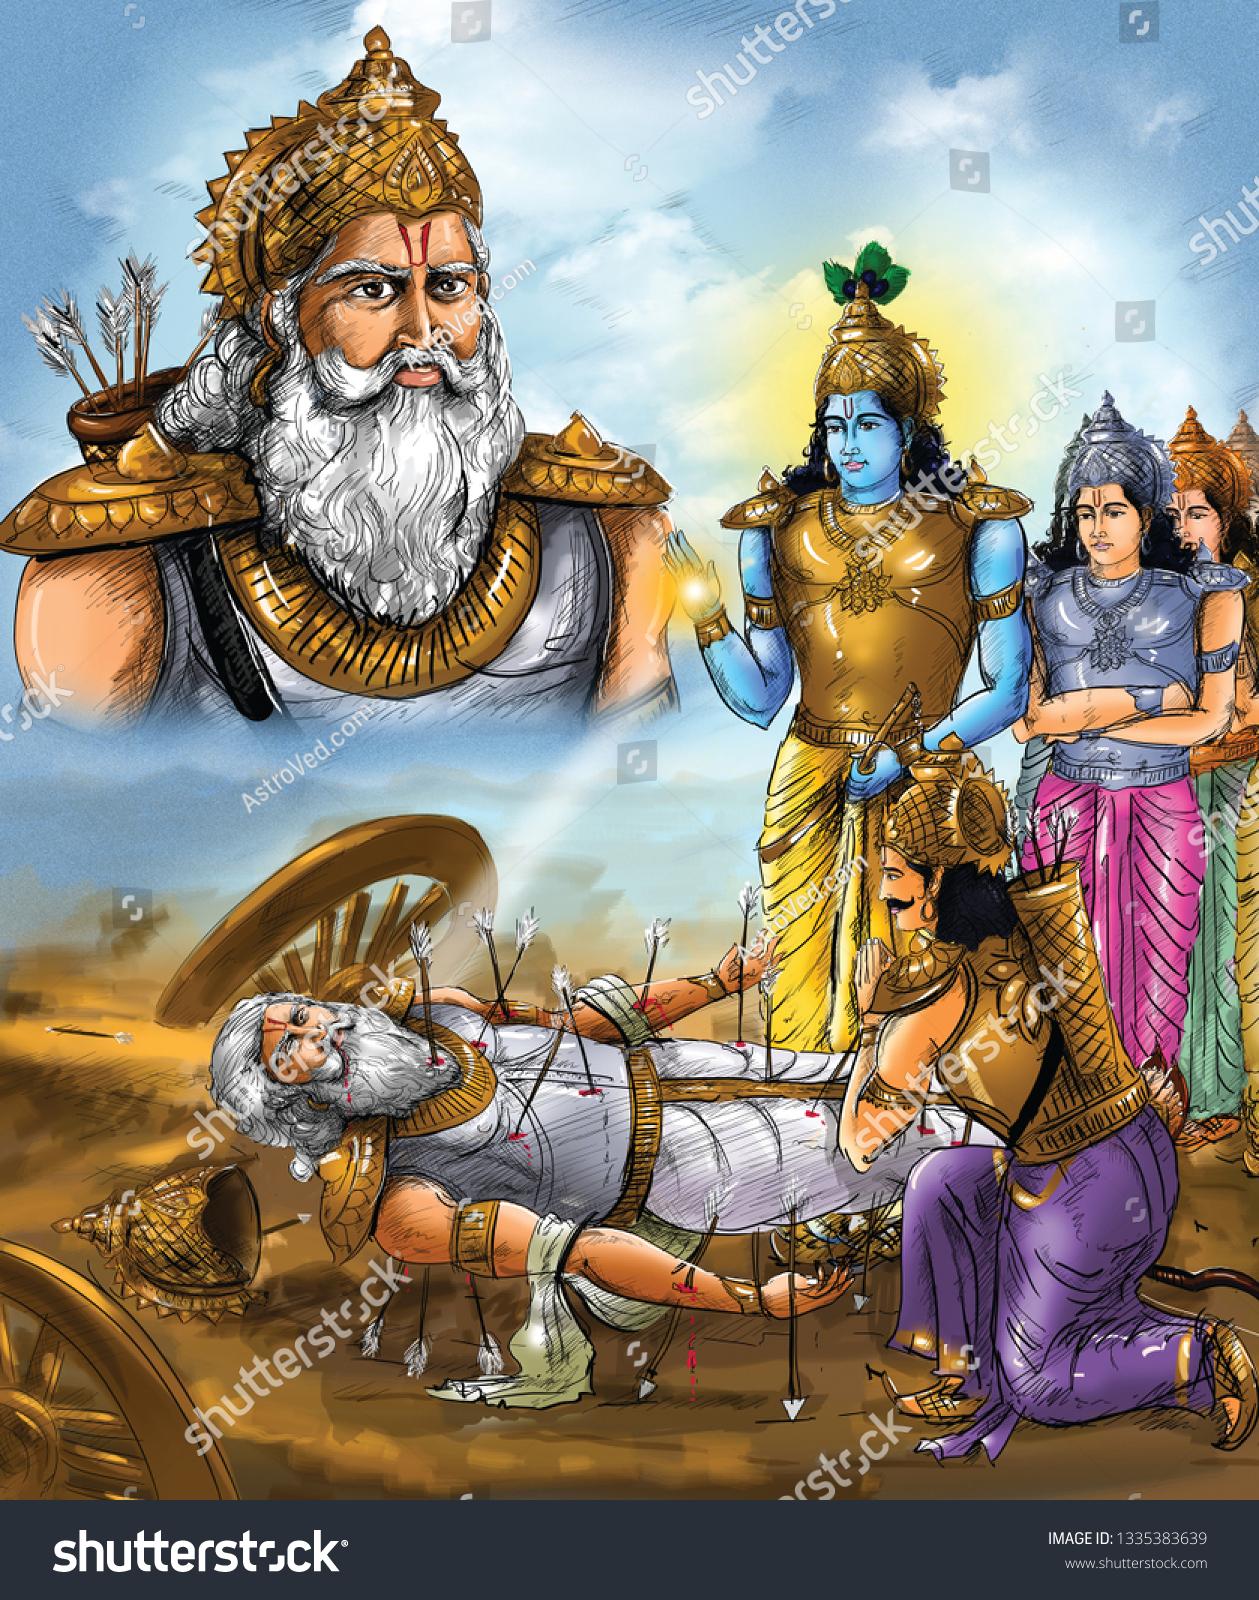 Bhishma Lies On Bed Arrows Battlefield Stock Illustration 1335383639